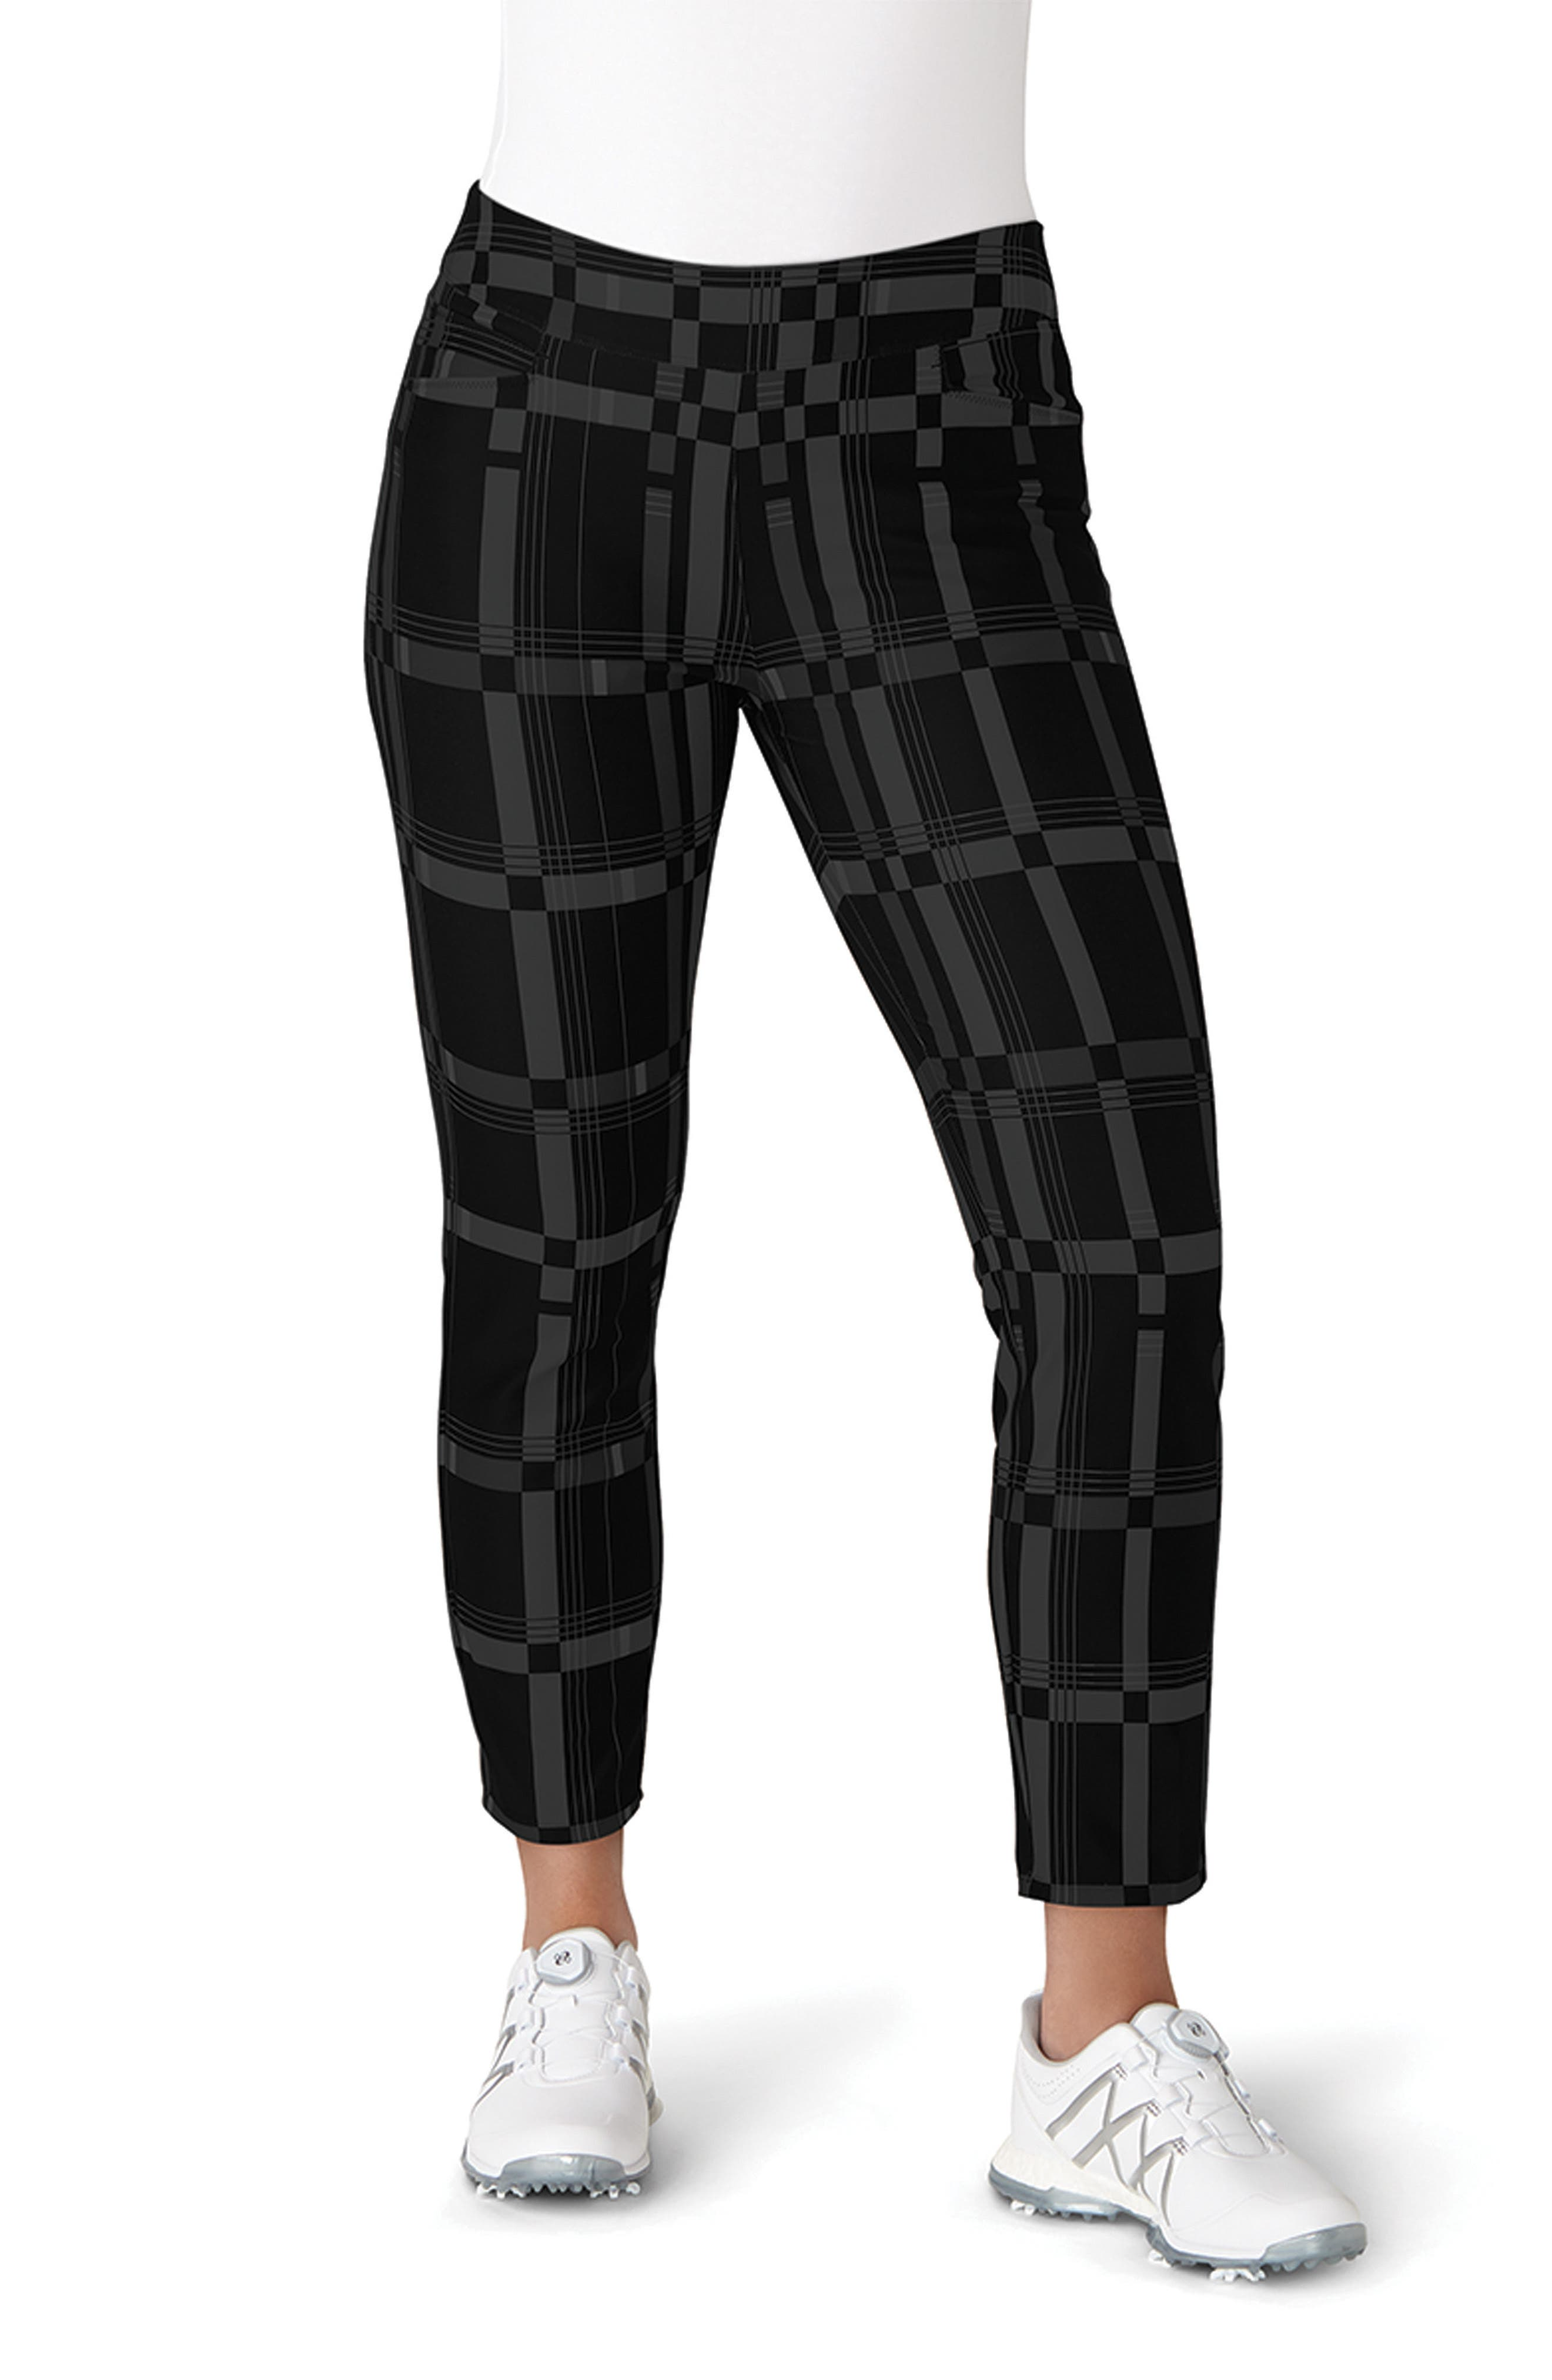 adistar Ankle Pants,                         Main,                         color, Black